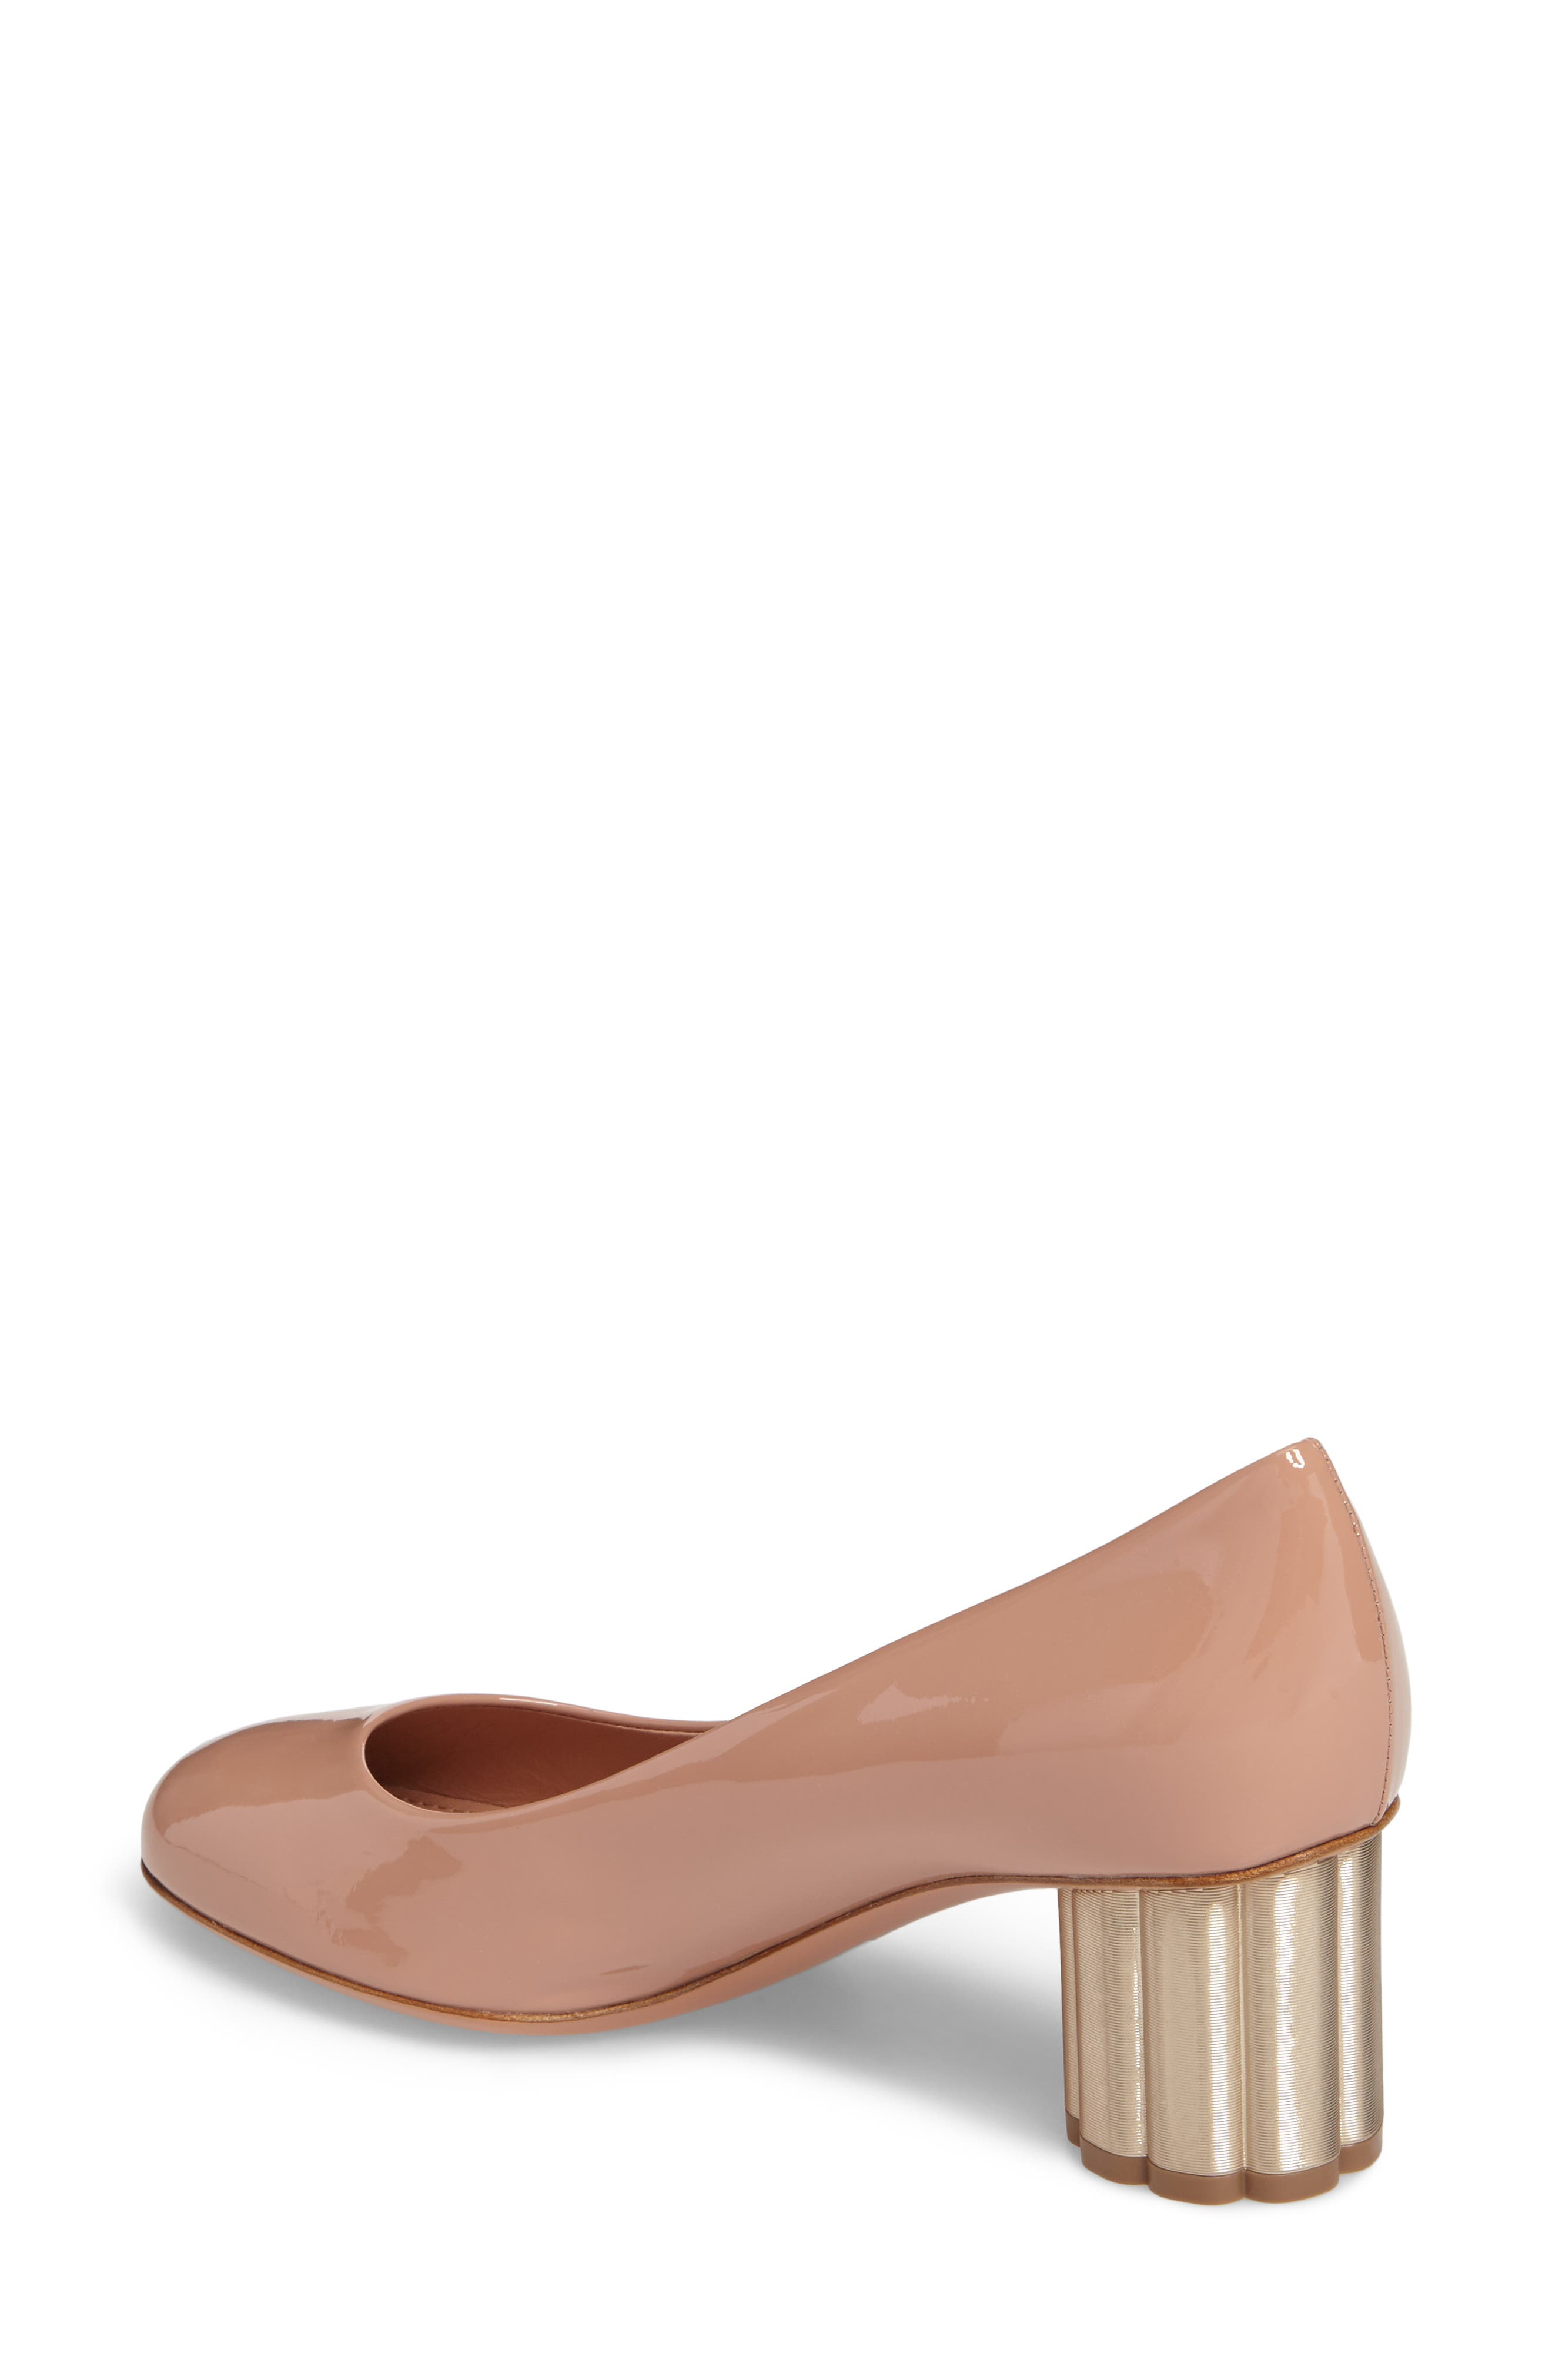 Alternate Image 2  - Salvatore Ferragamo Rounded Toe Flower Heel Pump (Women)